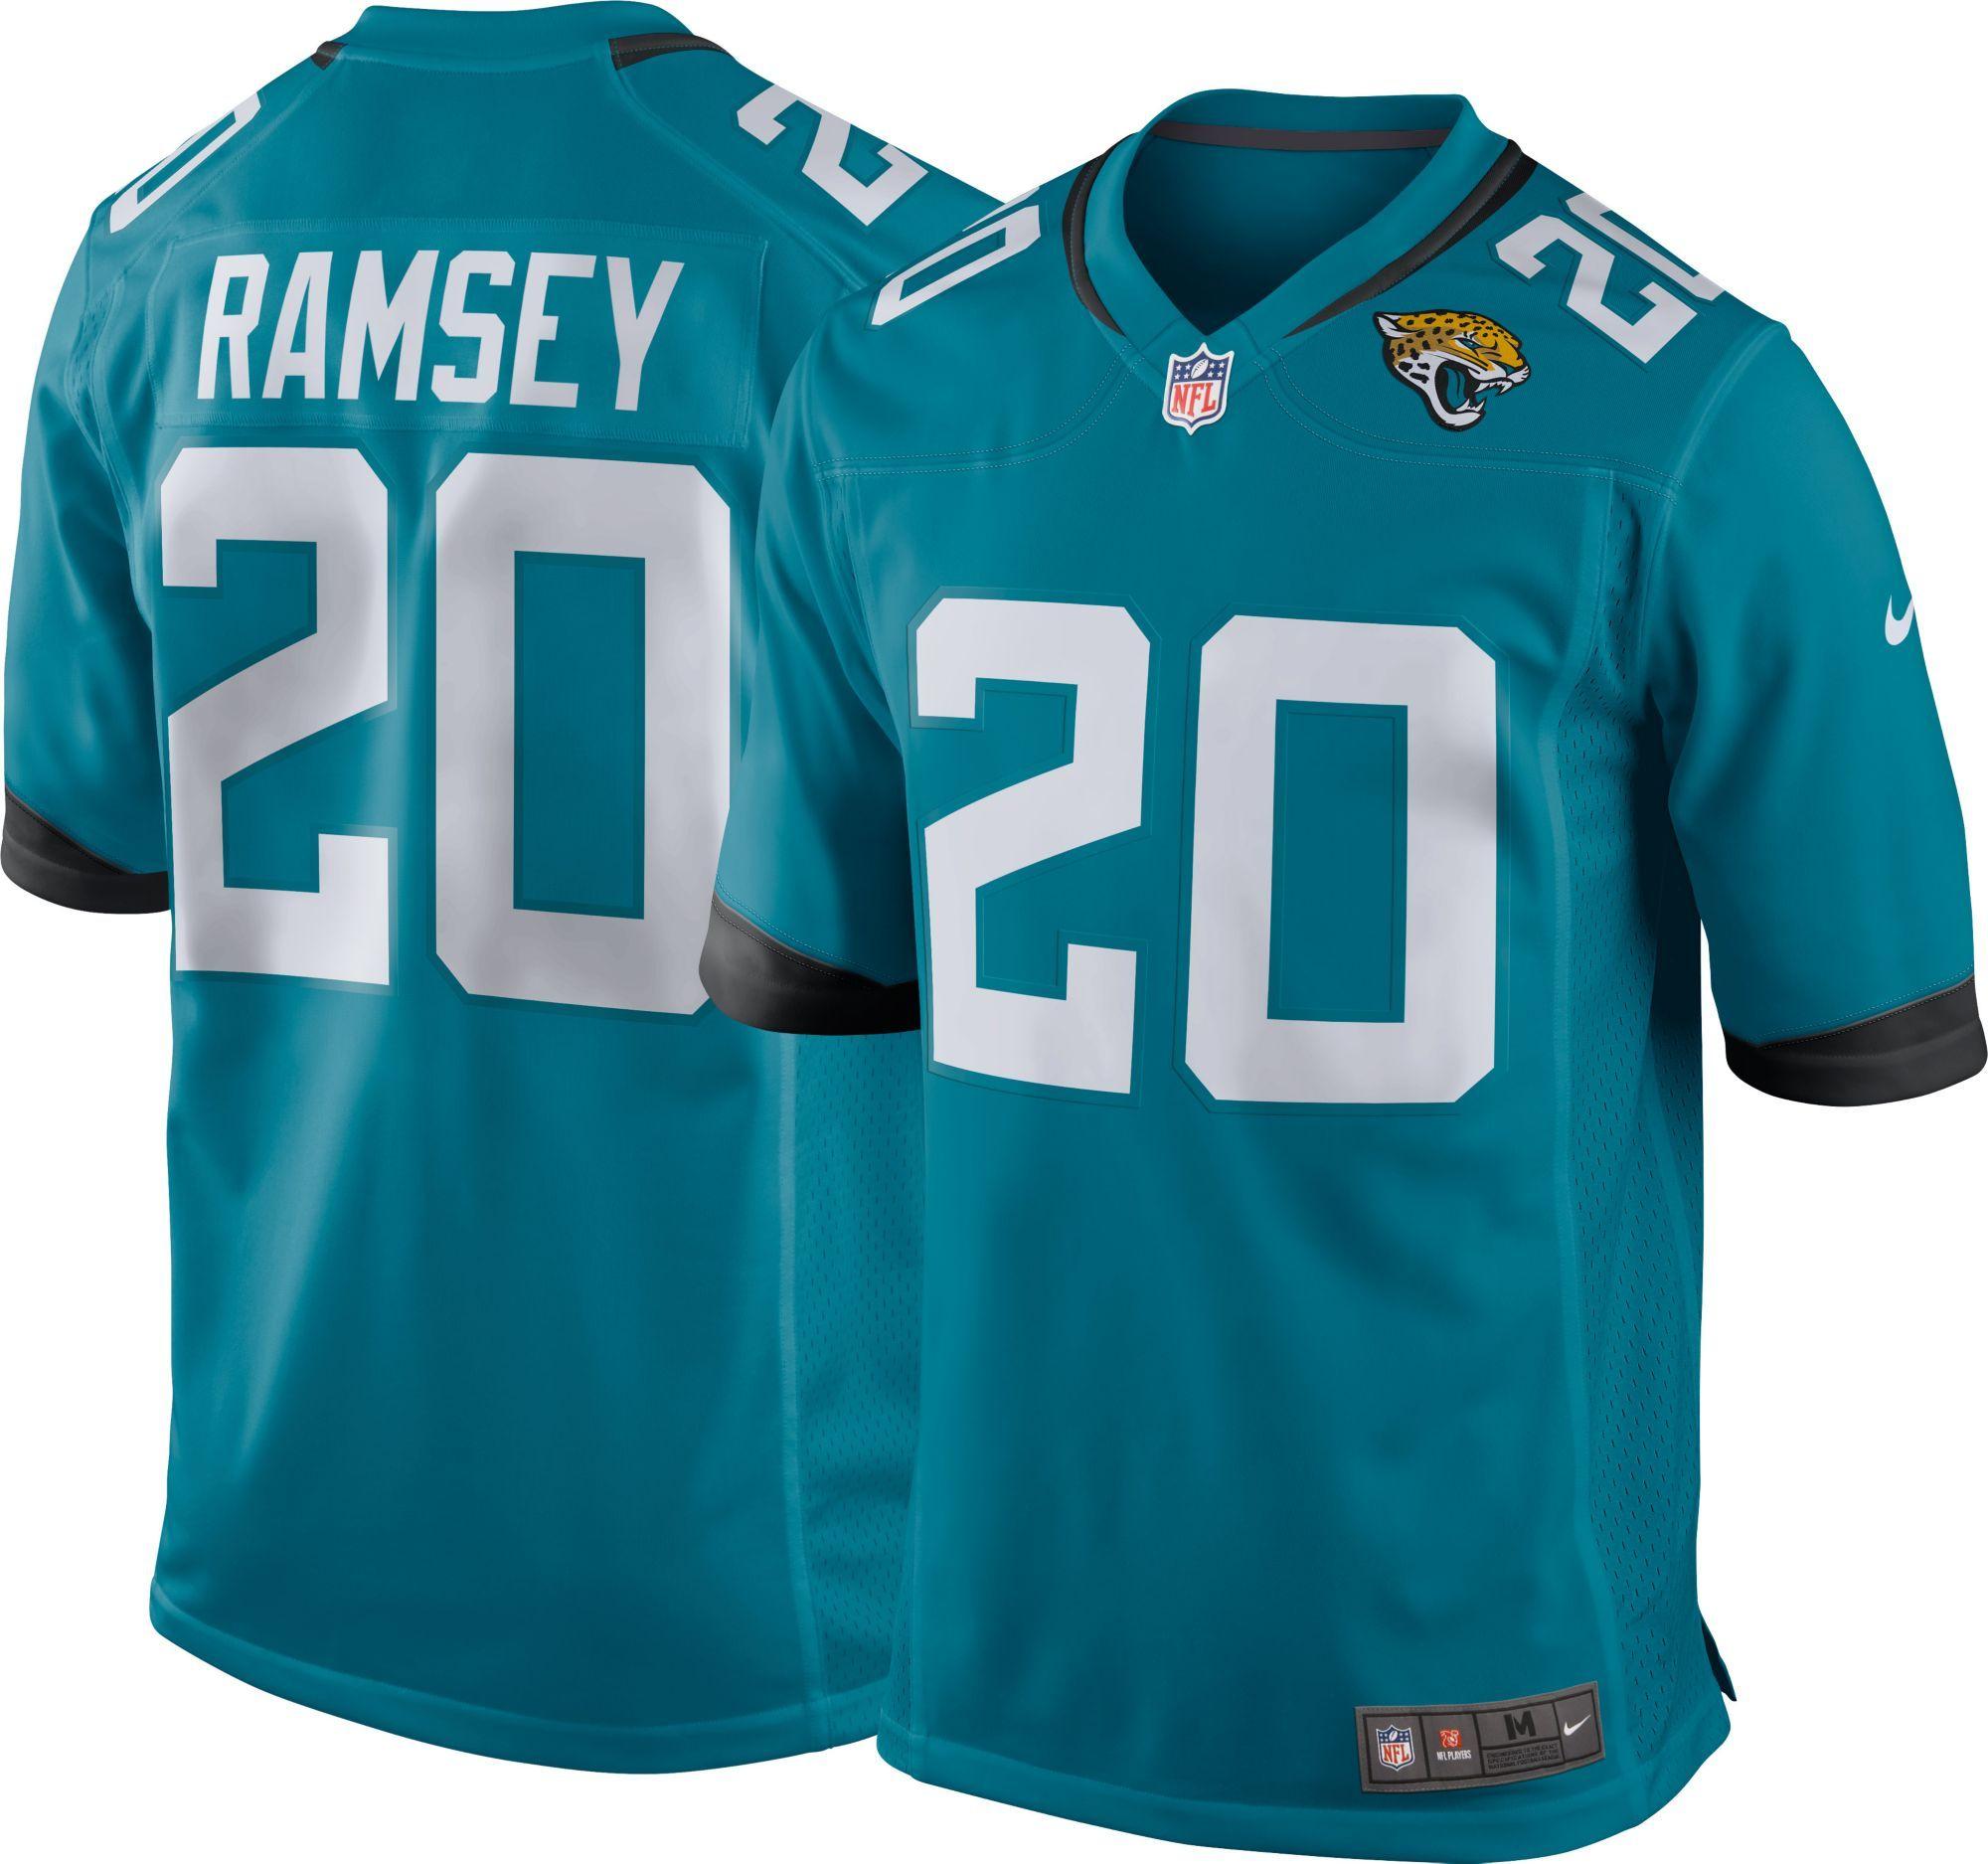 New Ramsey 20 Blue Nike Jacksonville Jaguars Men/'s NFL Game Jersey